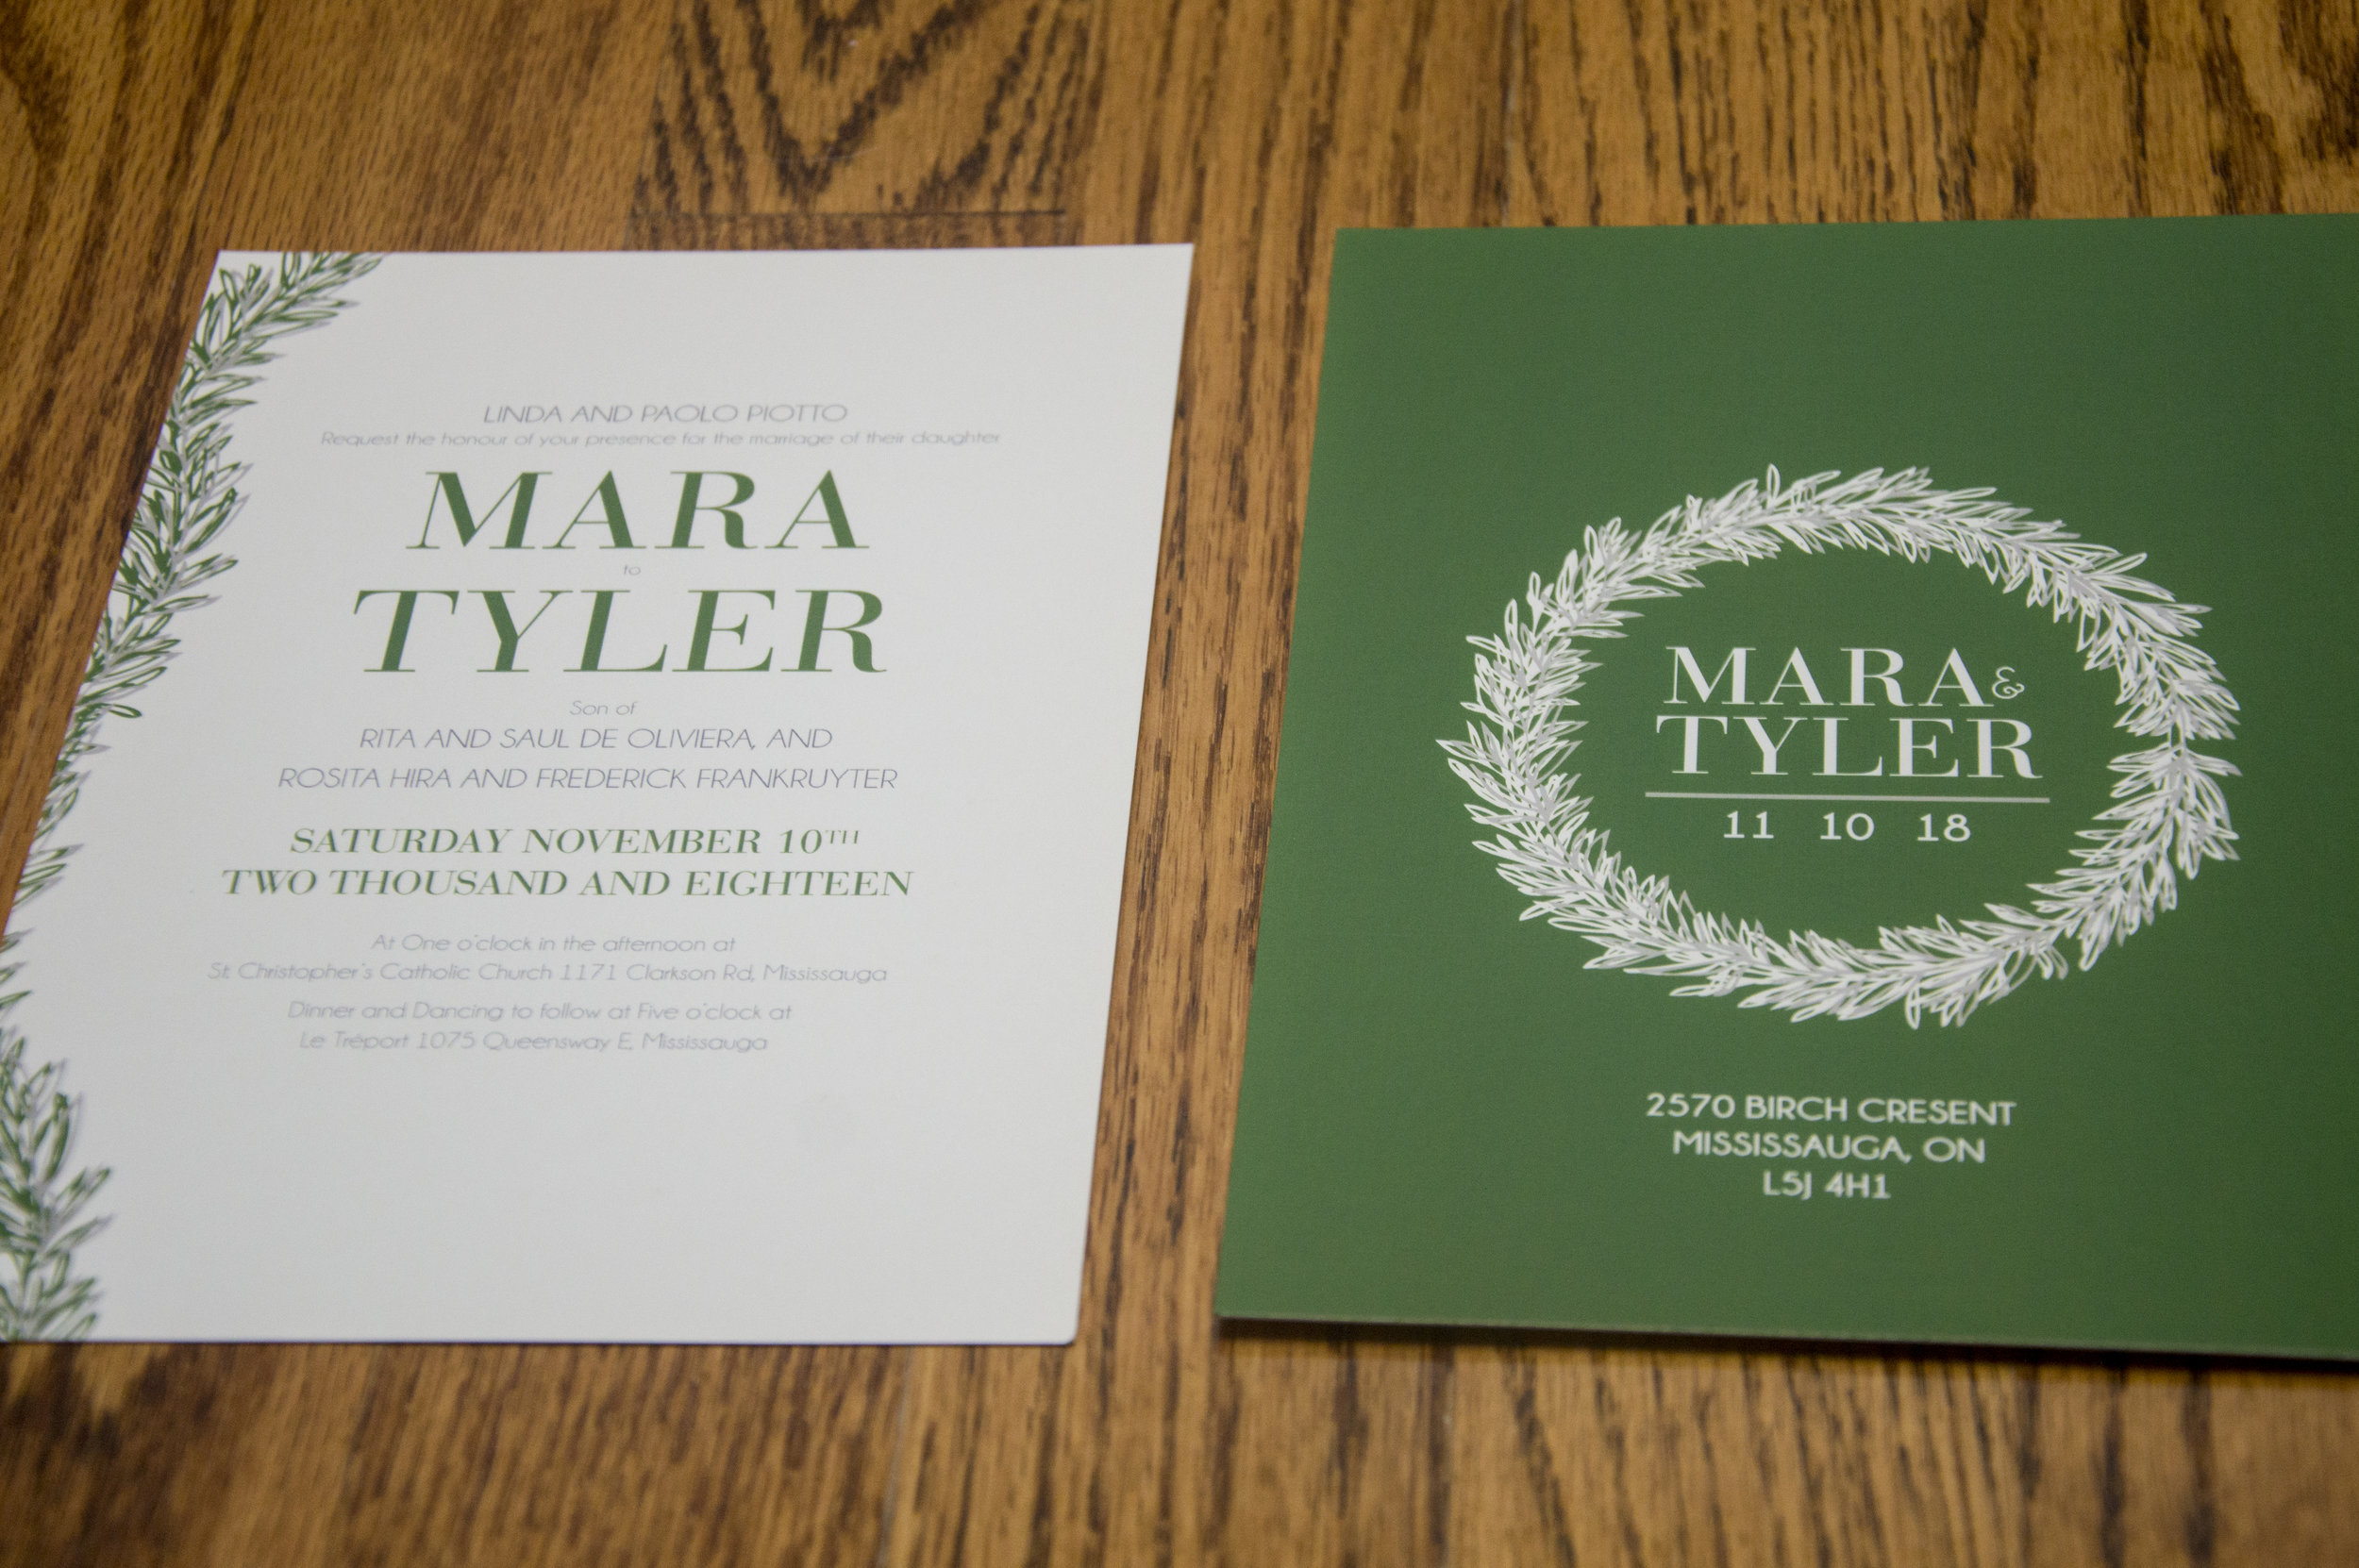 MaraAndTyler-1.jpg